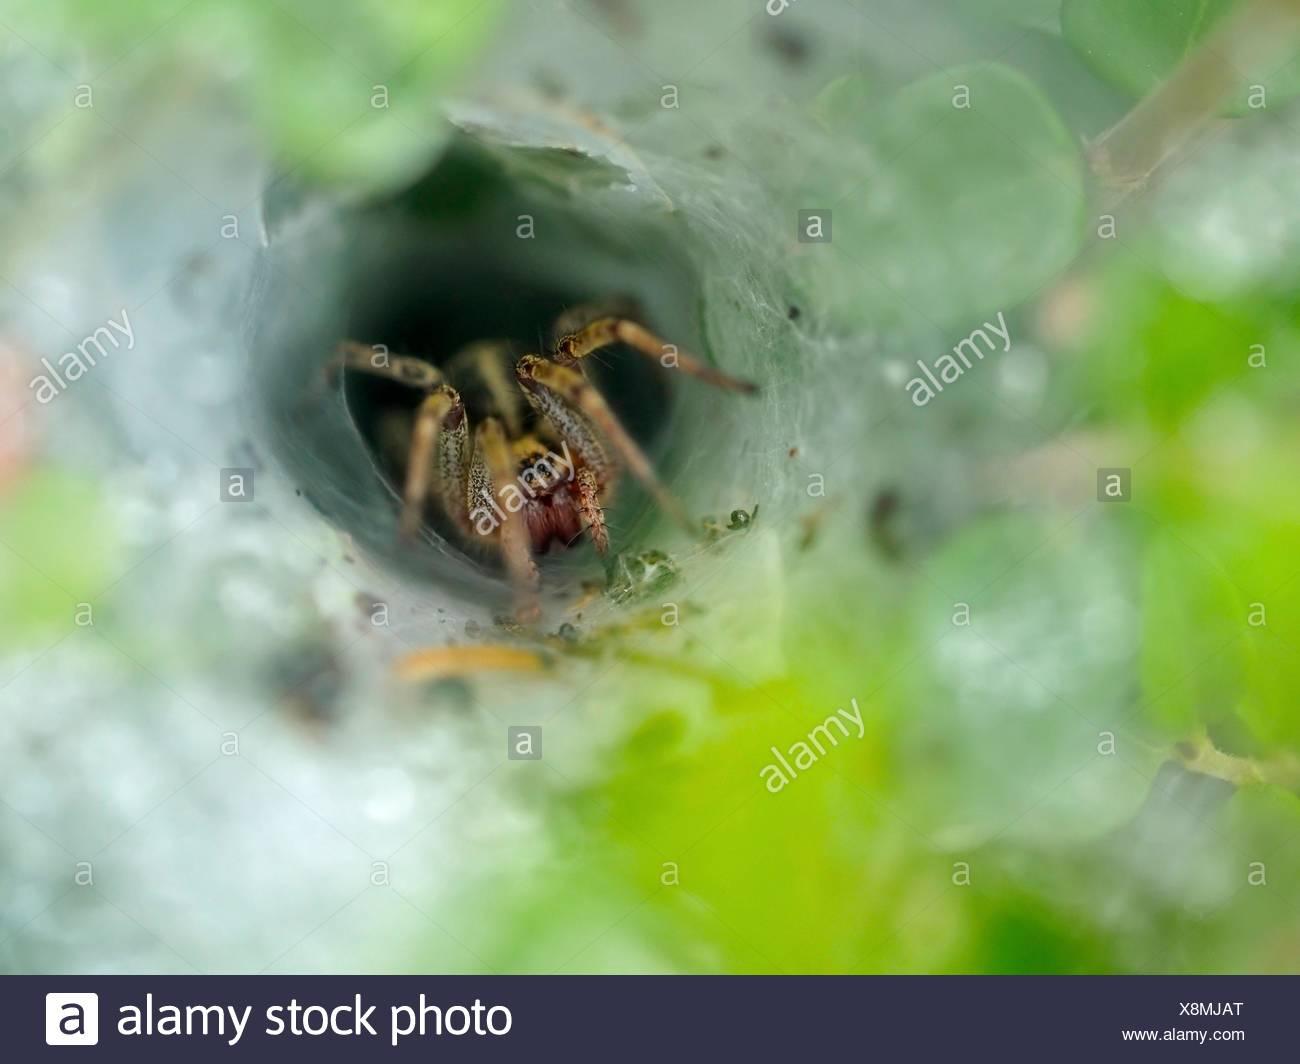 Spider at its web. Asturias autonomous community. Spain. - Stock Image